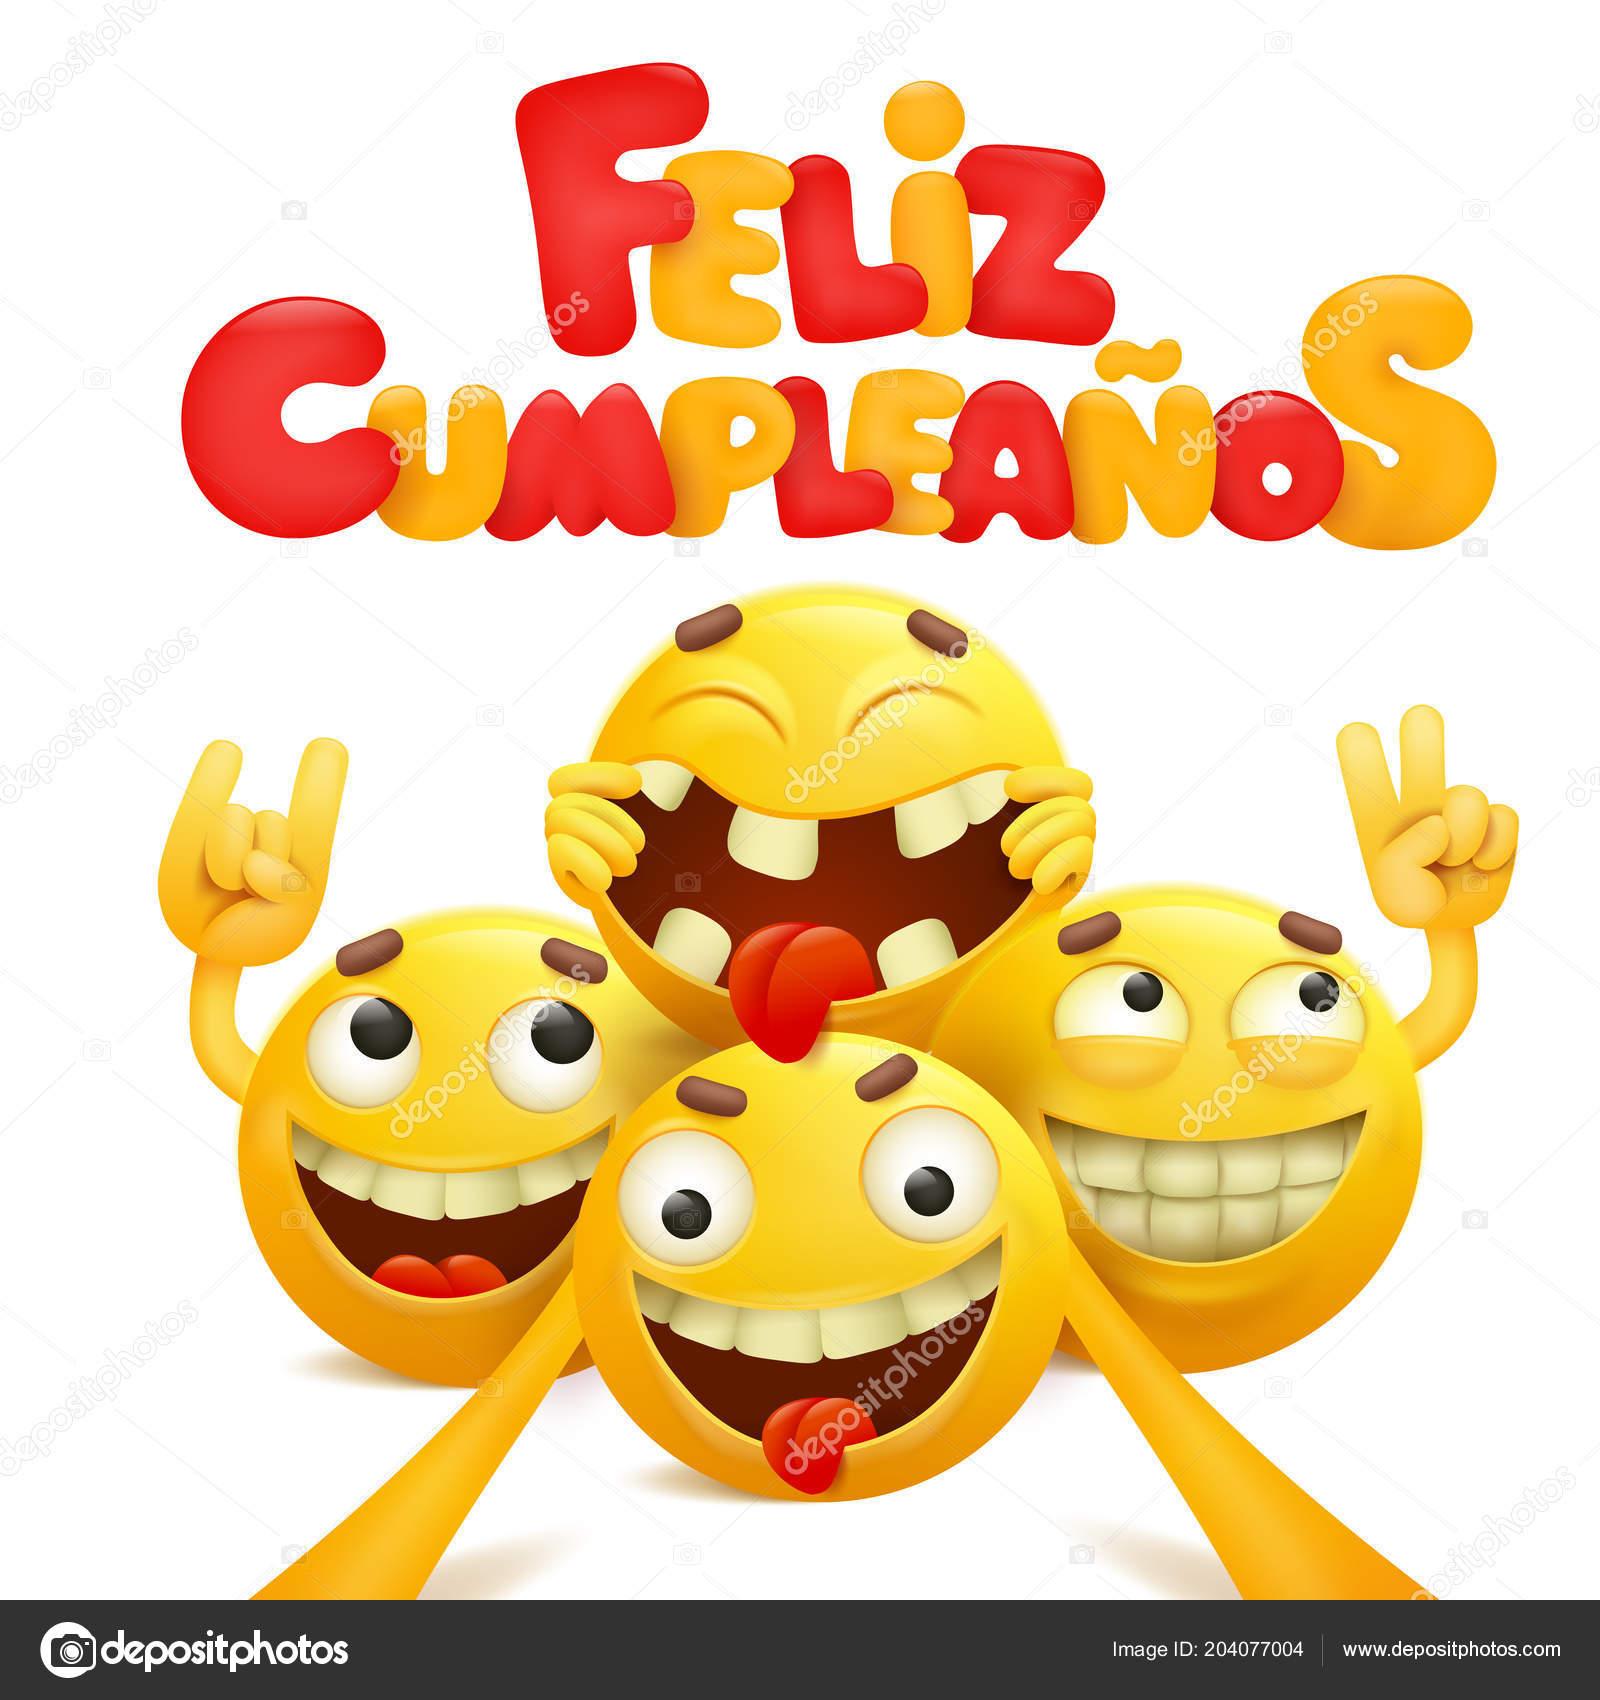 Feliz Cumpleanos Happy Birthday Spanish Greeting Card Group Yellow